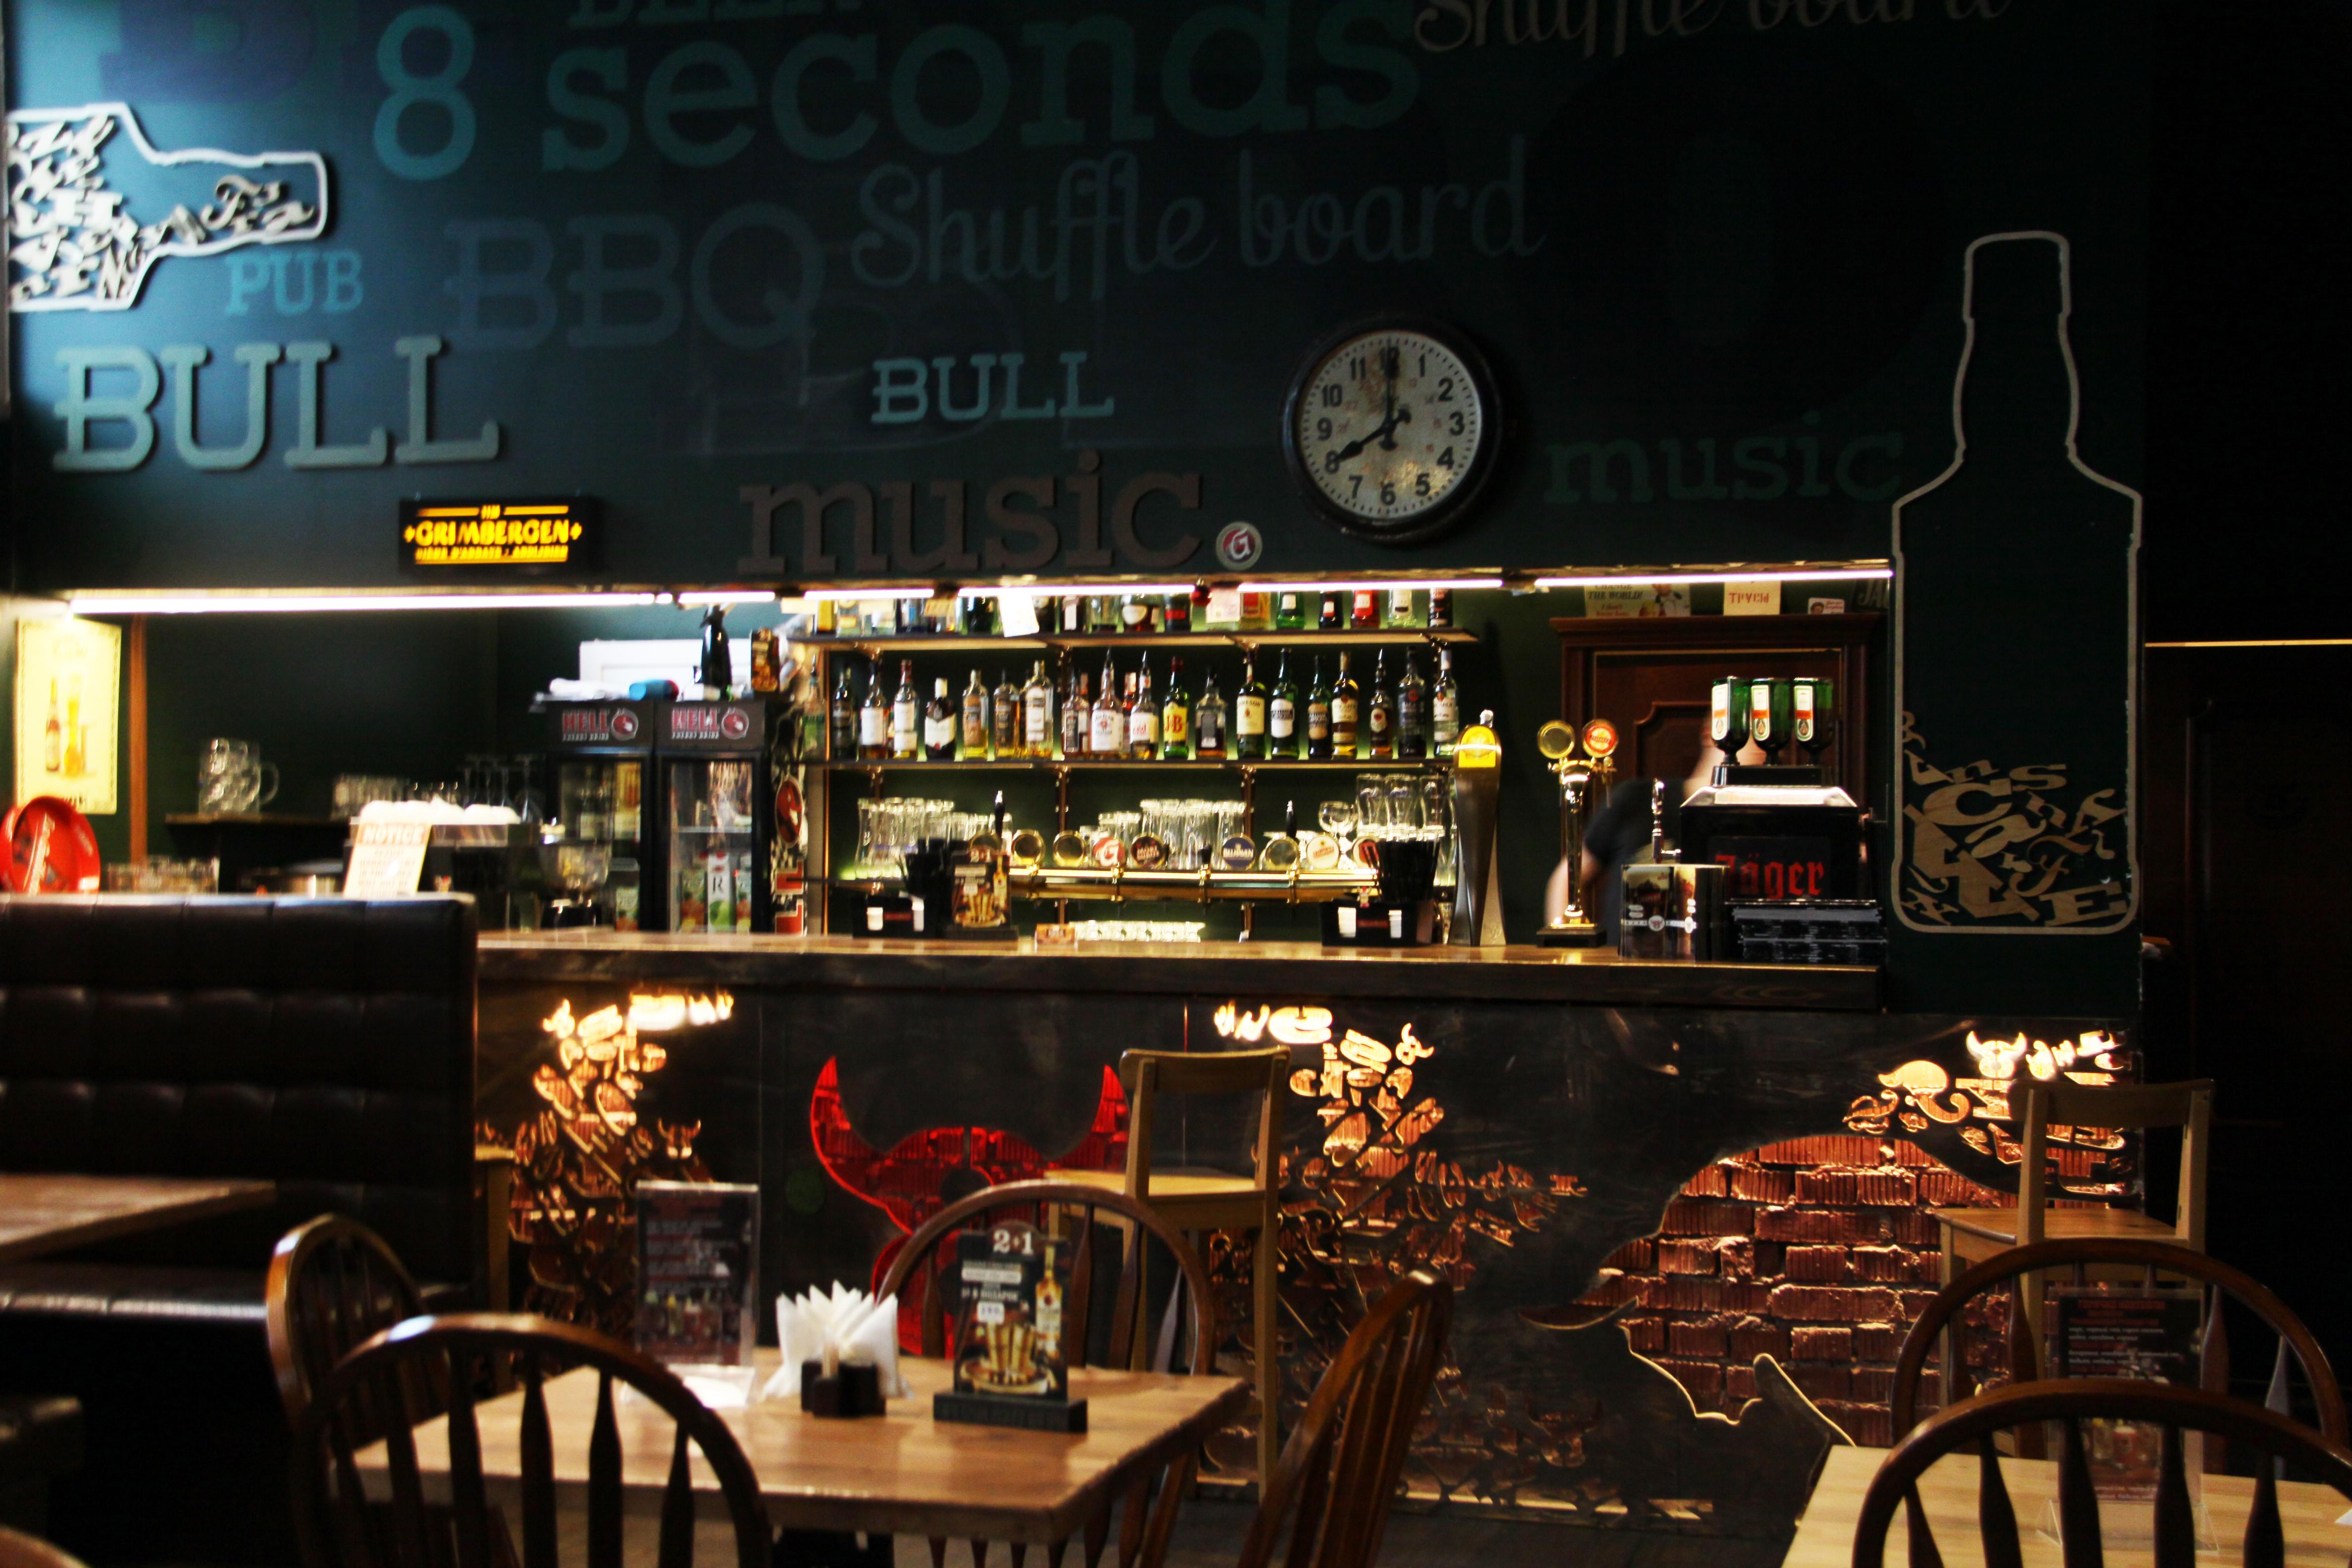 8 Seconds Pub